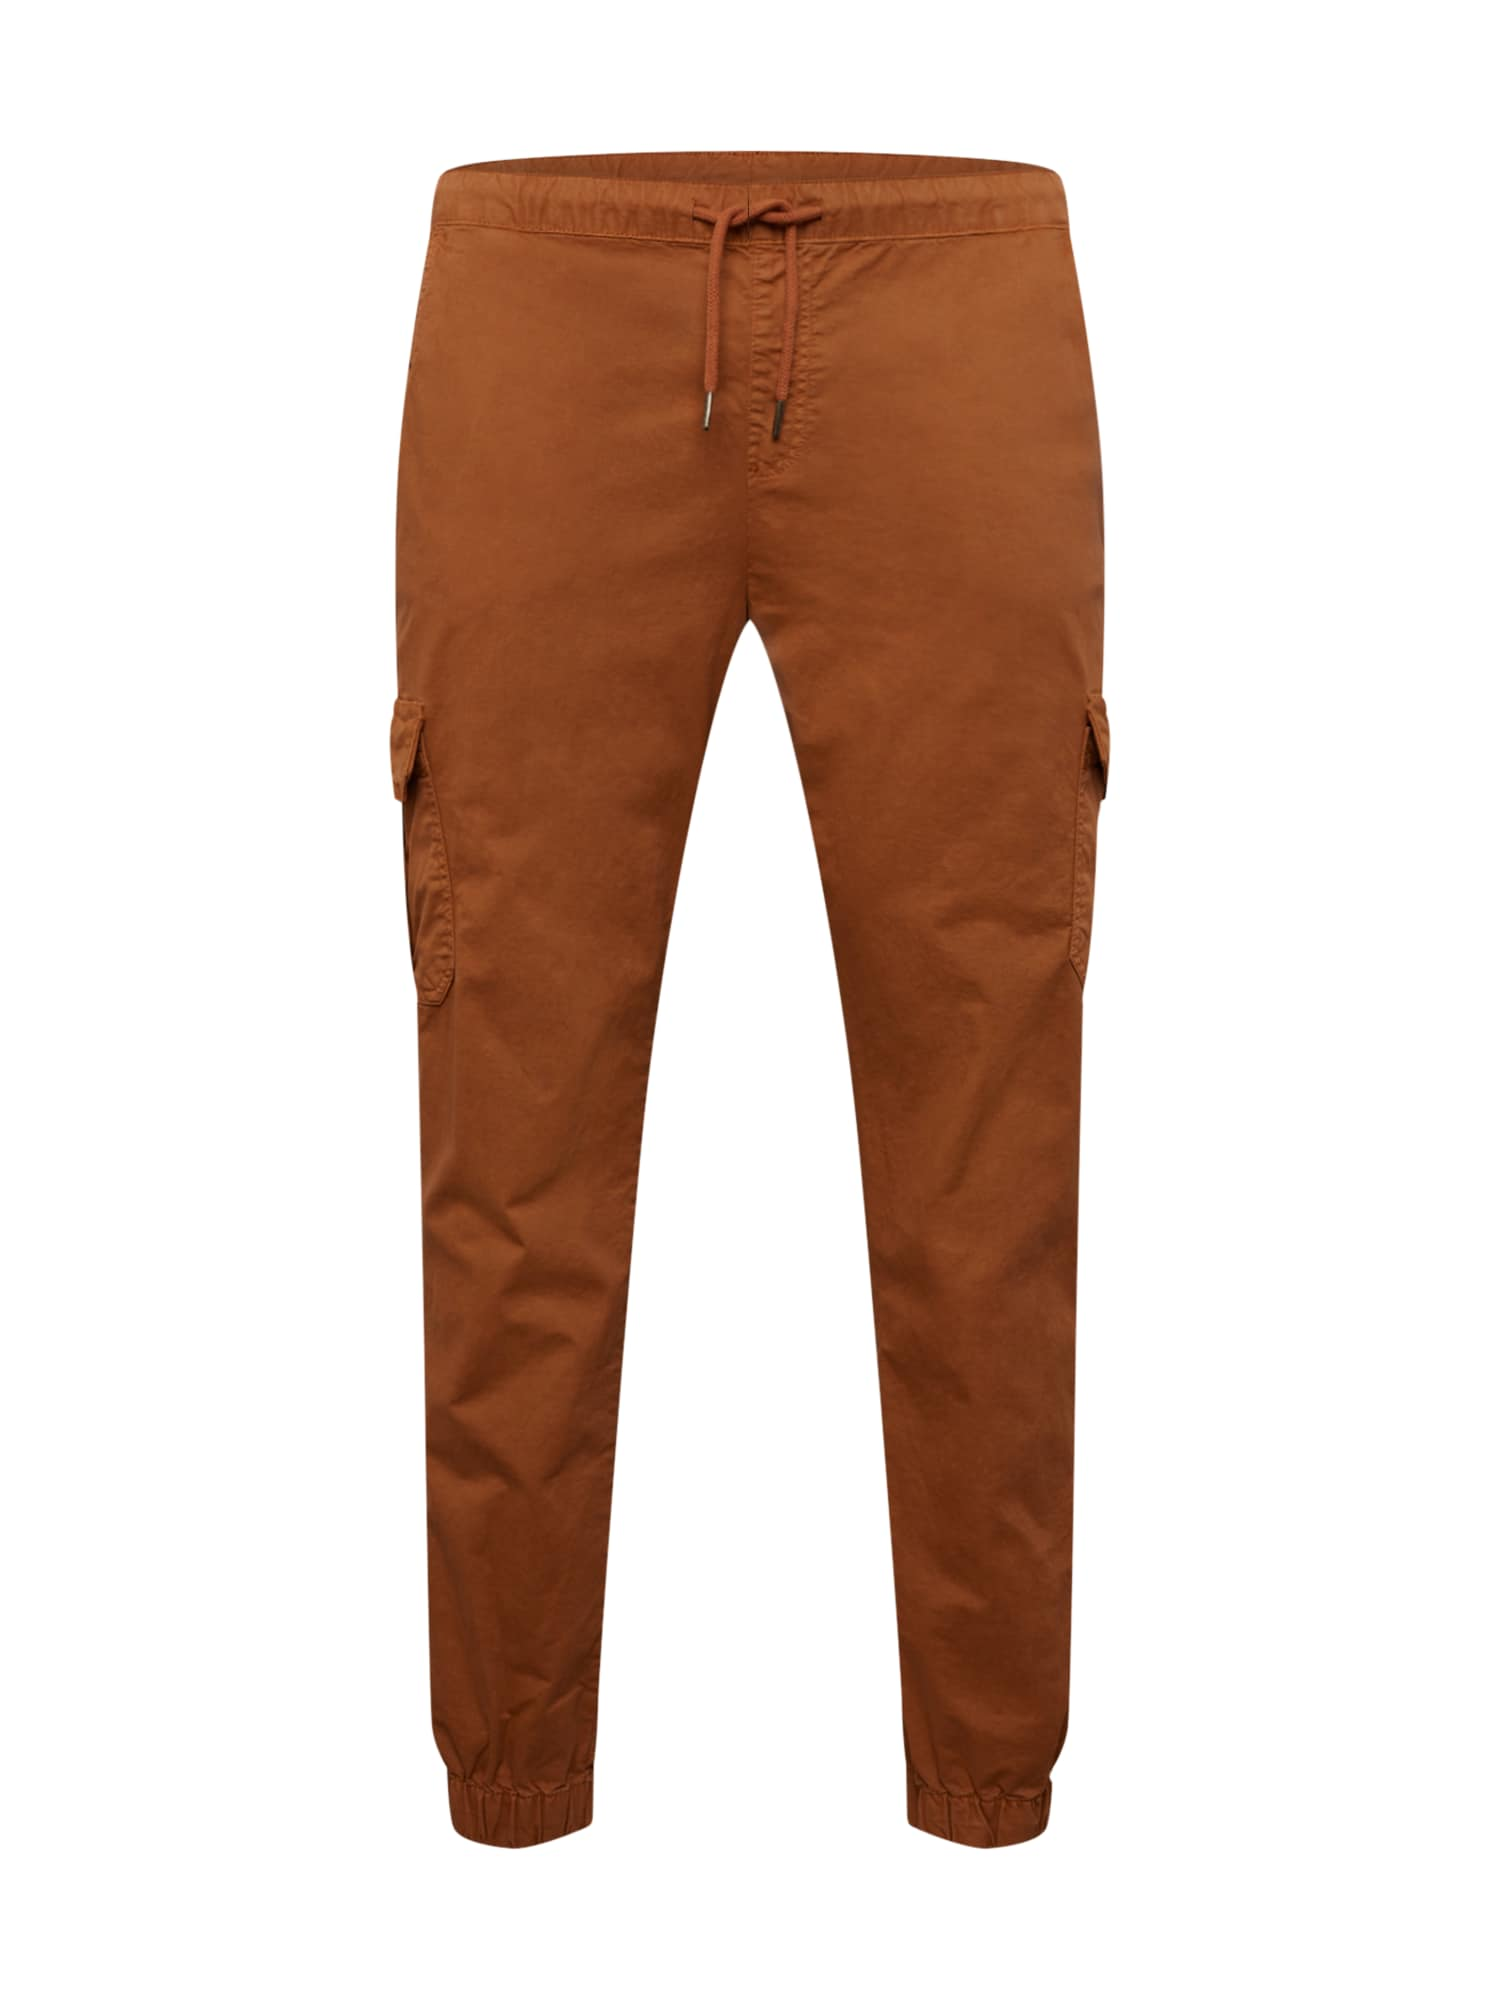 Urban Classics Curvy Laisvo stiliaus kelnės ruda